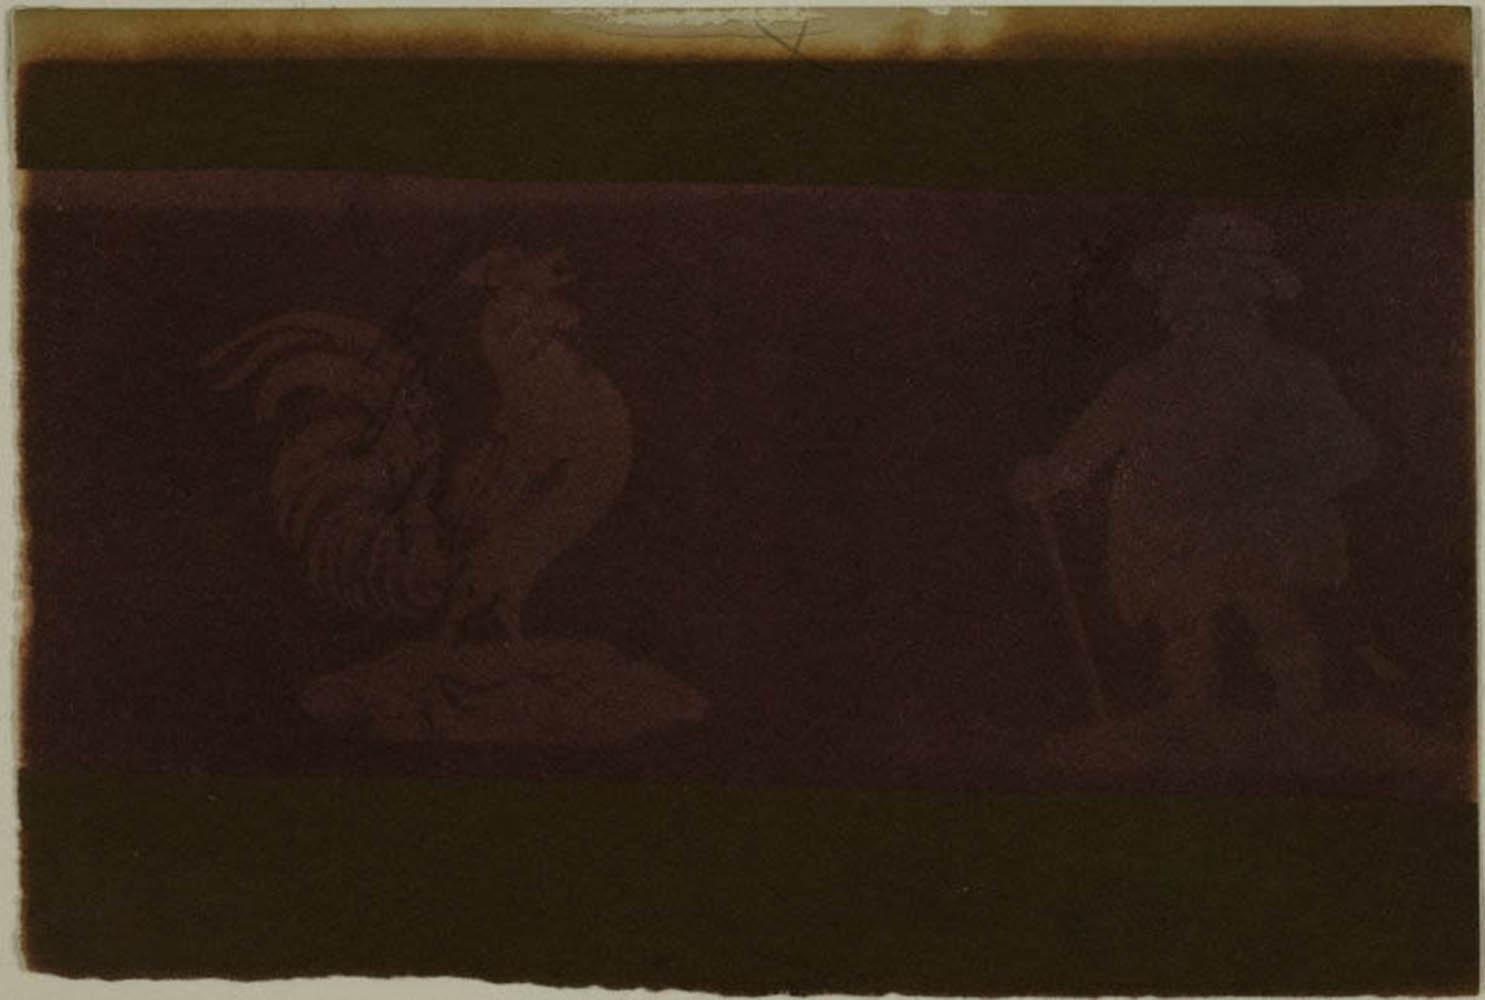 SC3671-ArtInstChicago-1975-1058